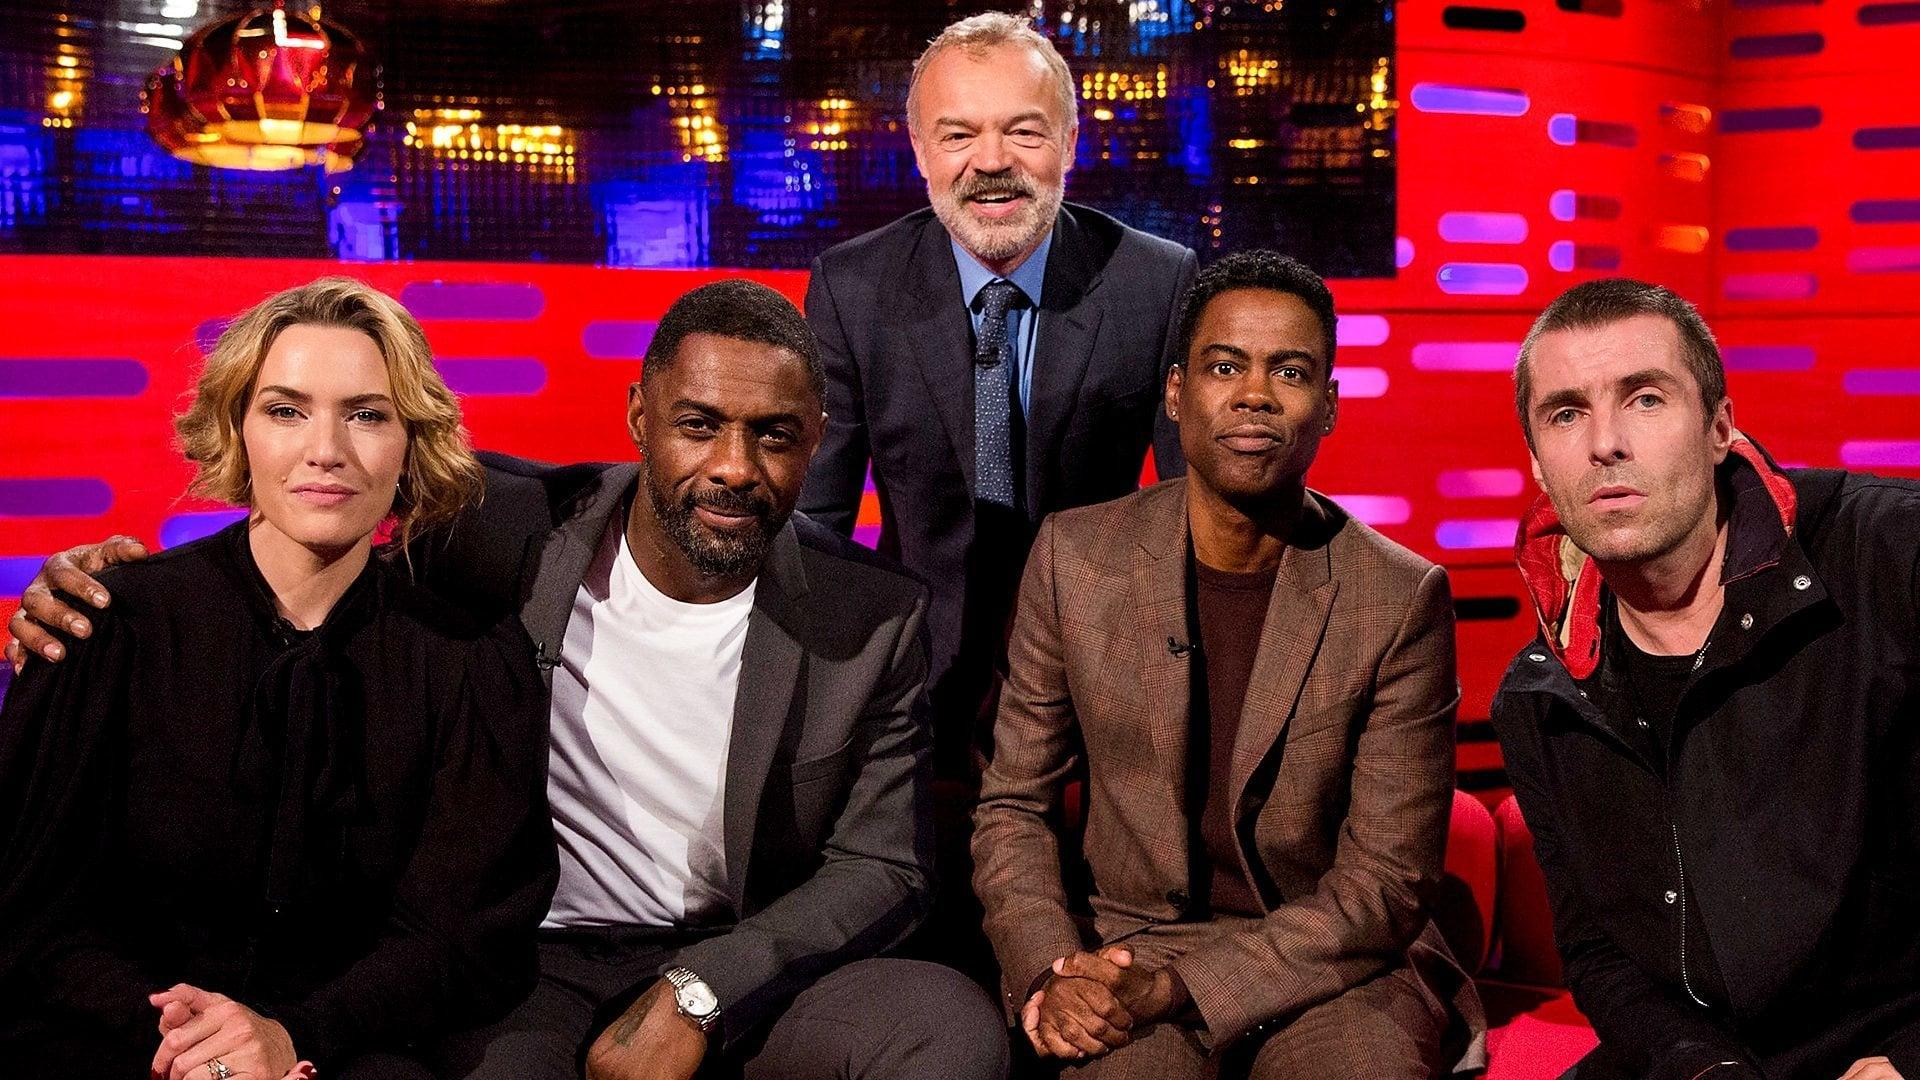 The Graham Norton Show Season 22 :Episode 2  Kate Winslet, Idris Elba, Chris Rock, Liam Gallagher